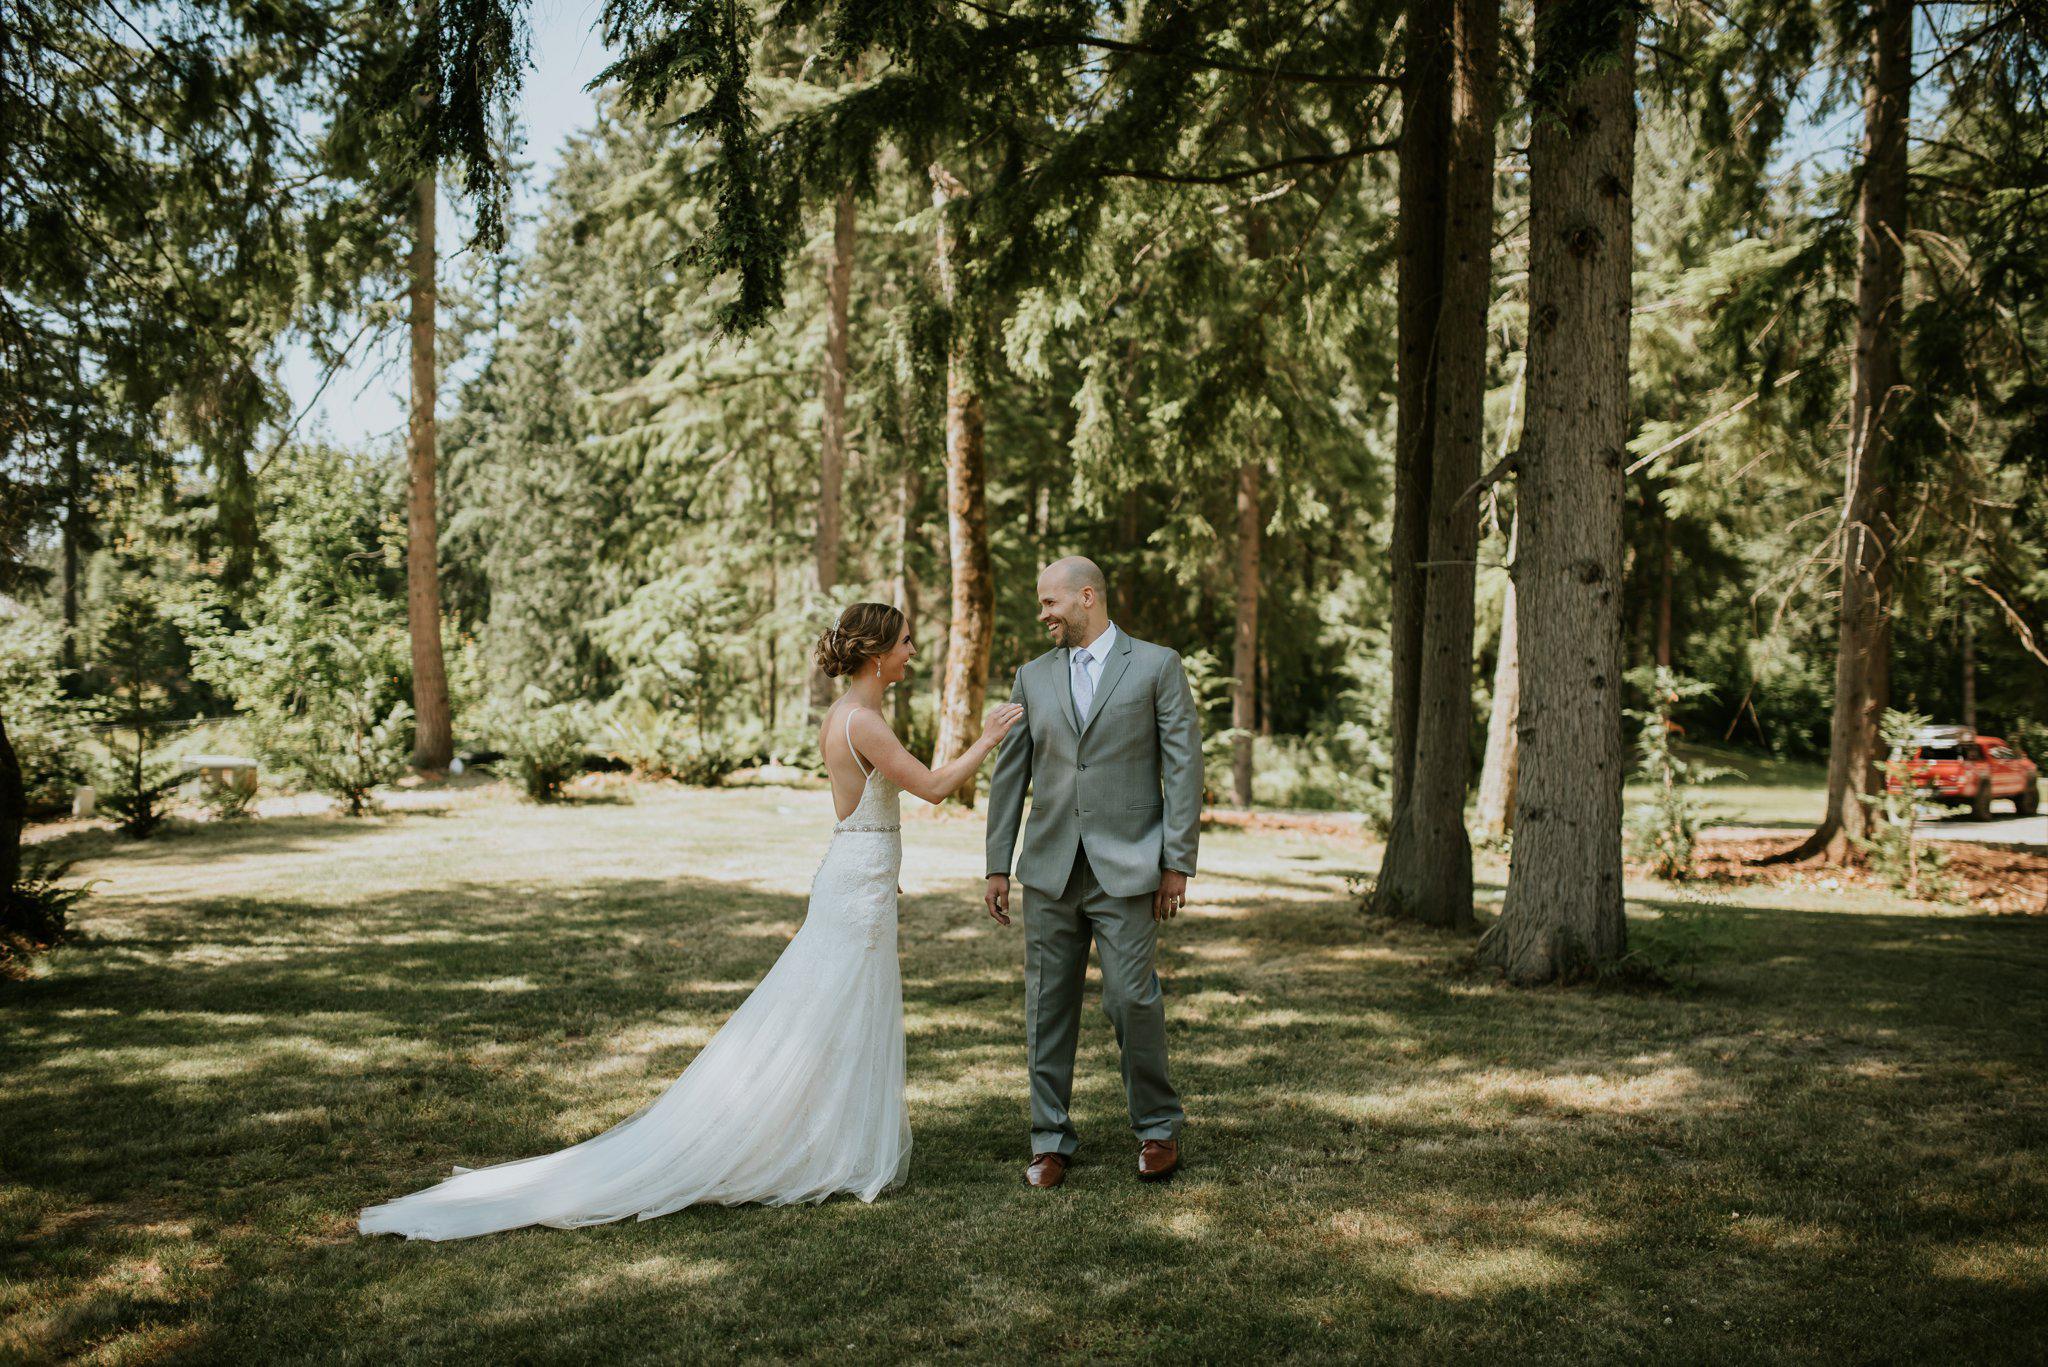 hollywood-school-house-wedding-seattle-photographer-caitlyn-nikula-33.jpg